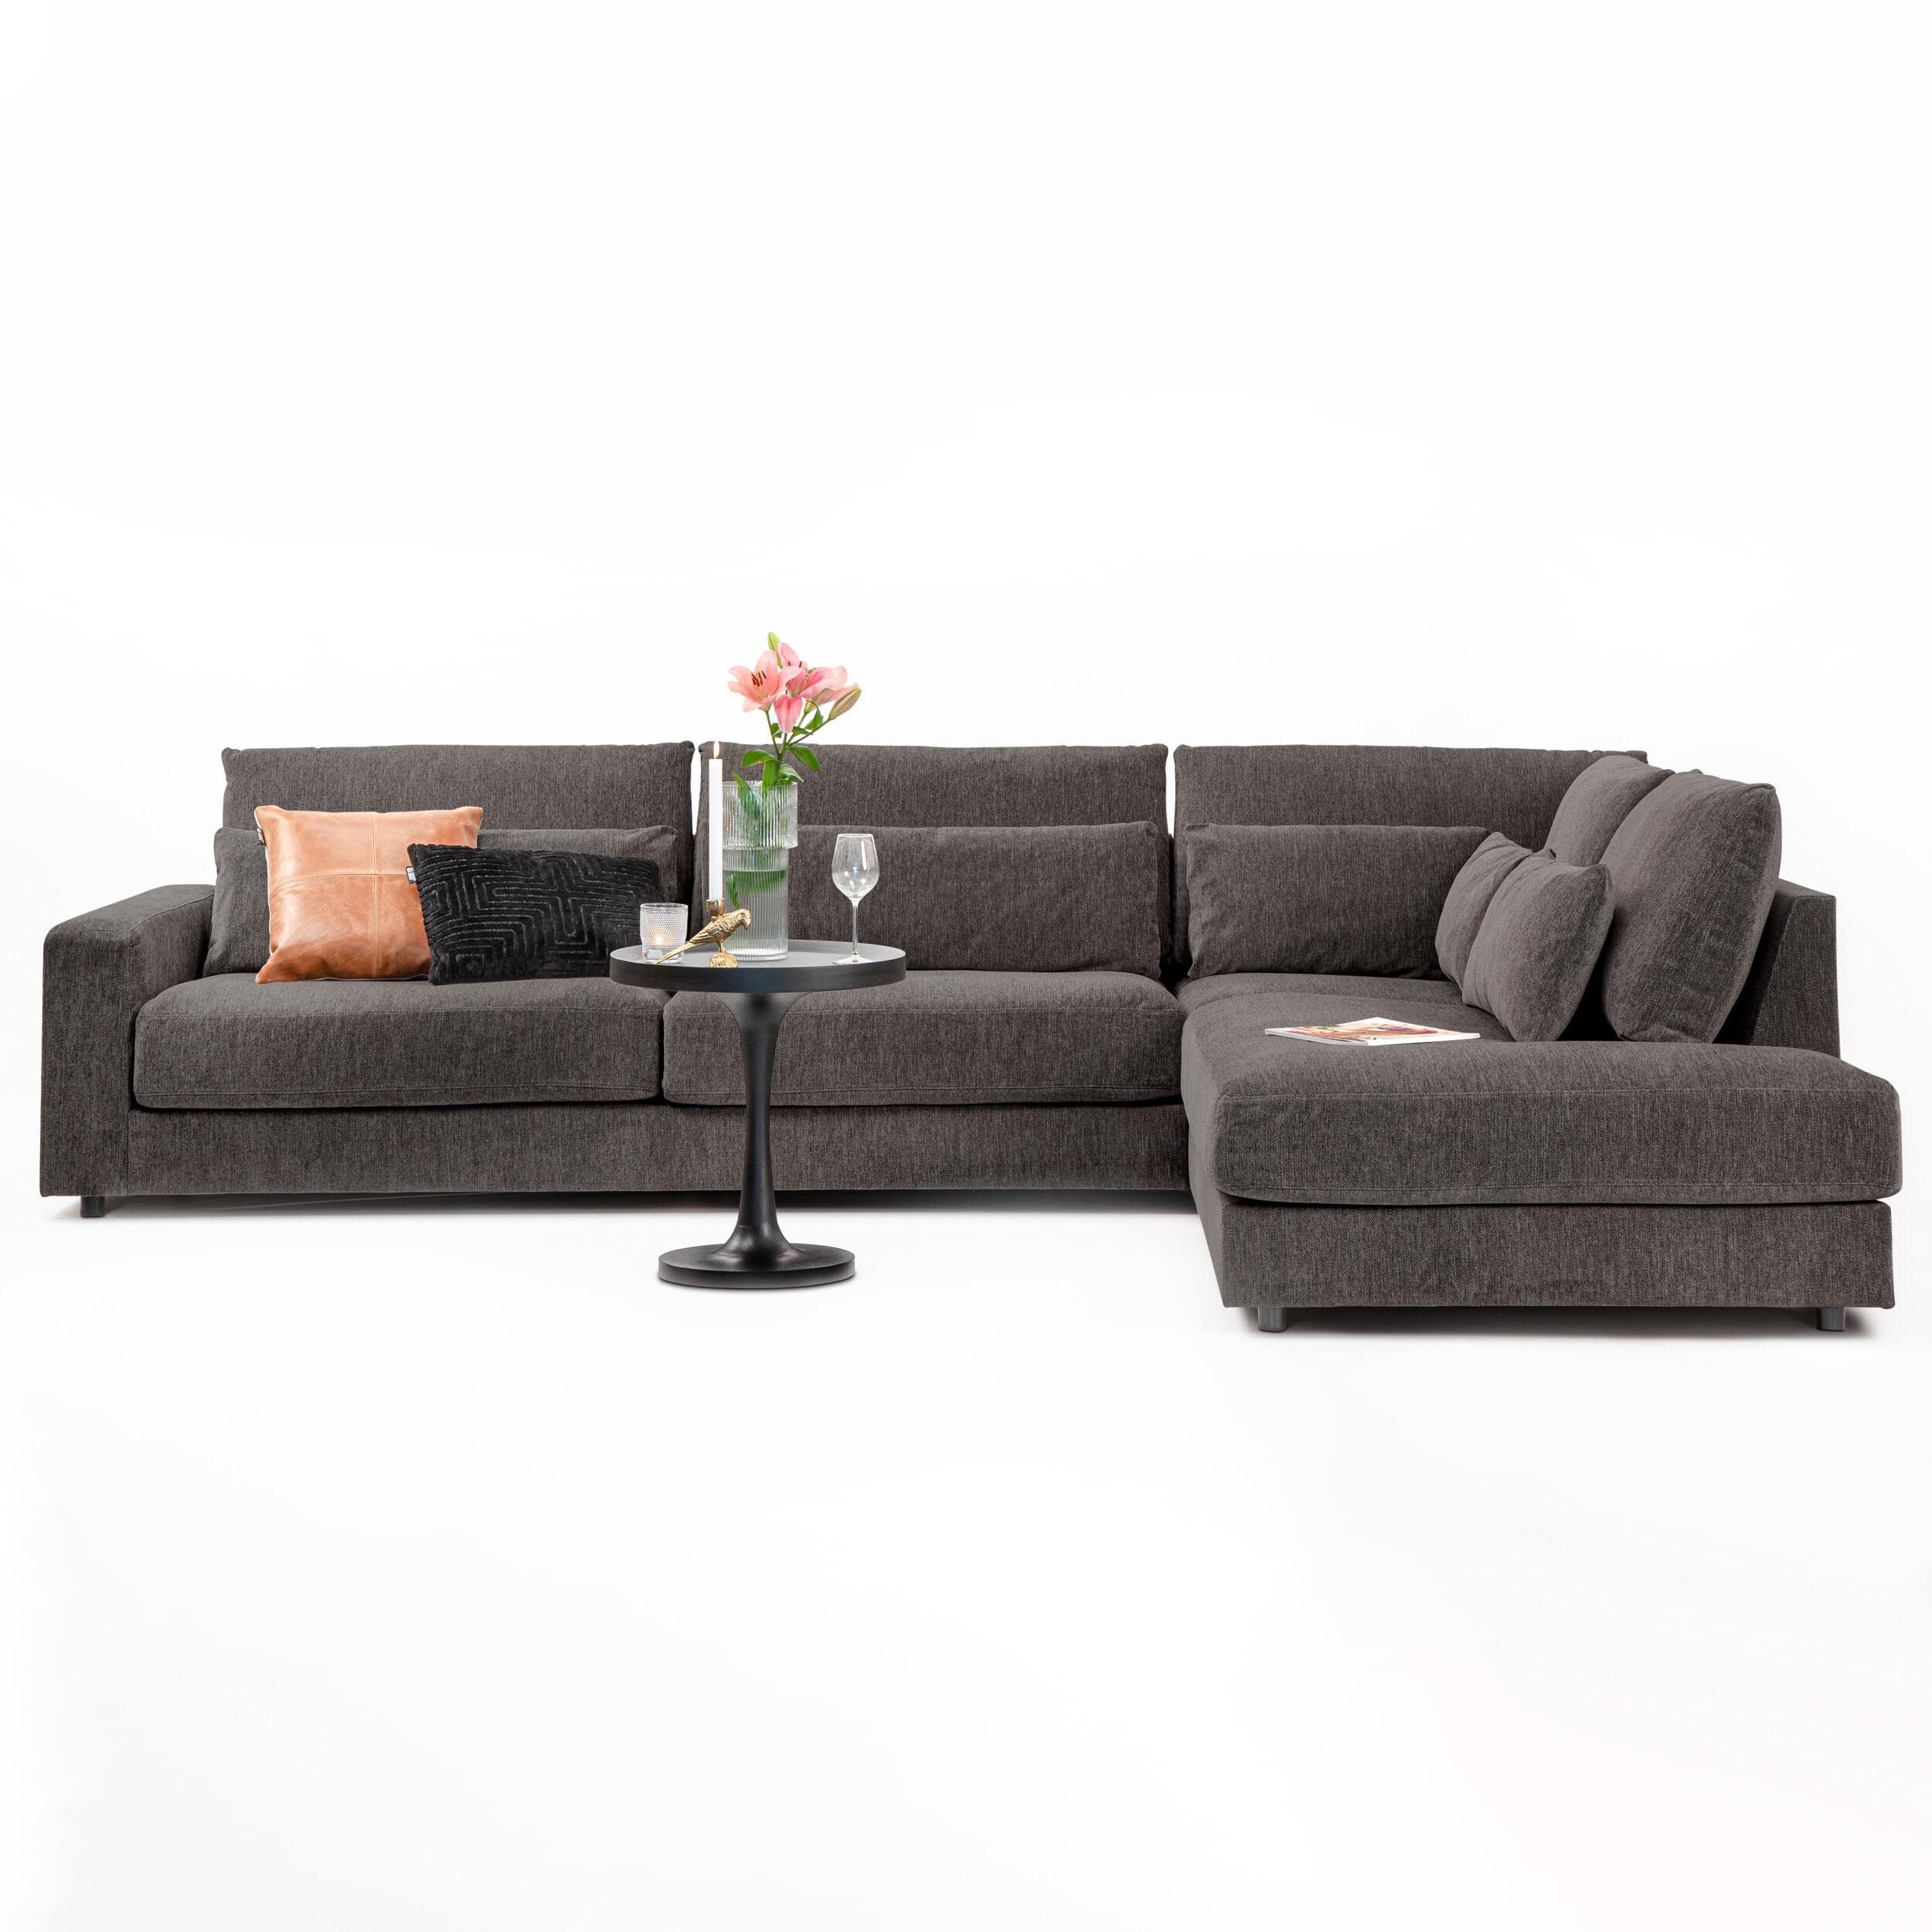 Sohome Hoekbank 'Willem'-Bruin-Lounge rechts